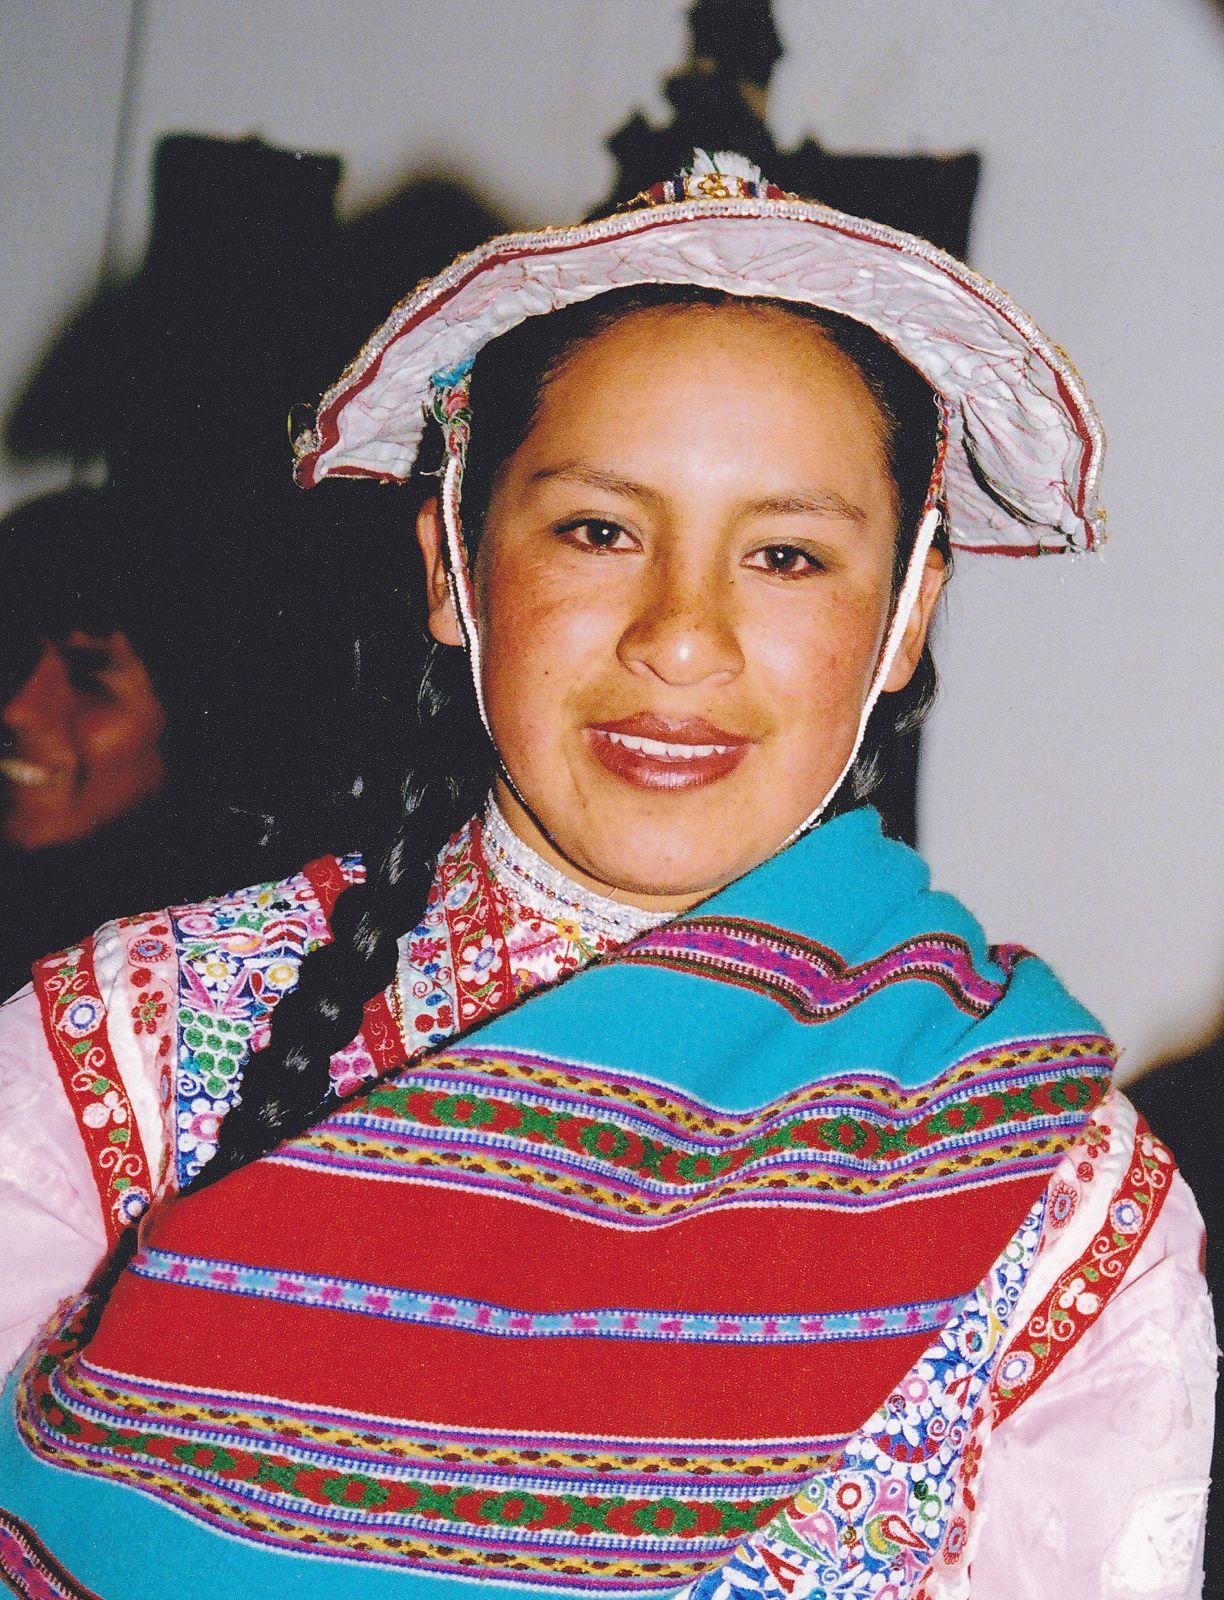 Peru women showing skin really